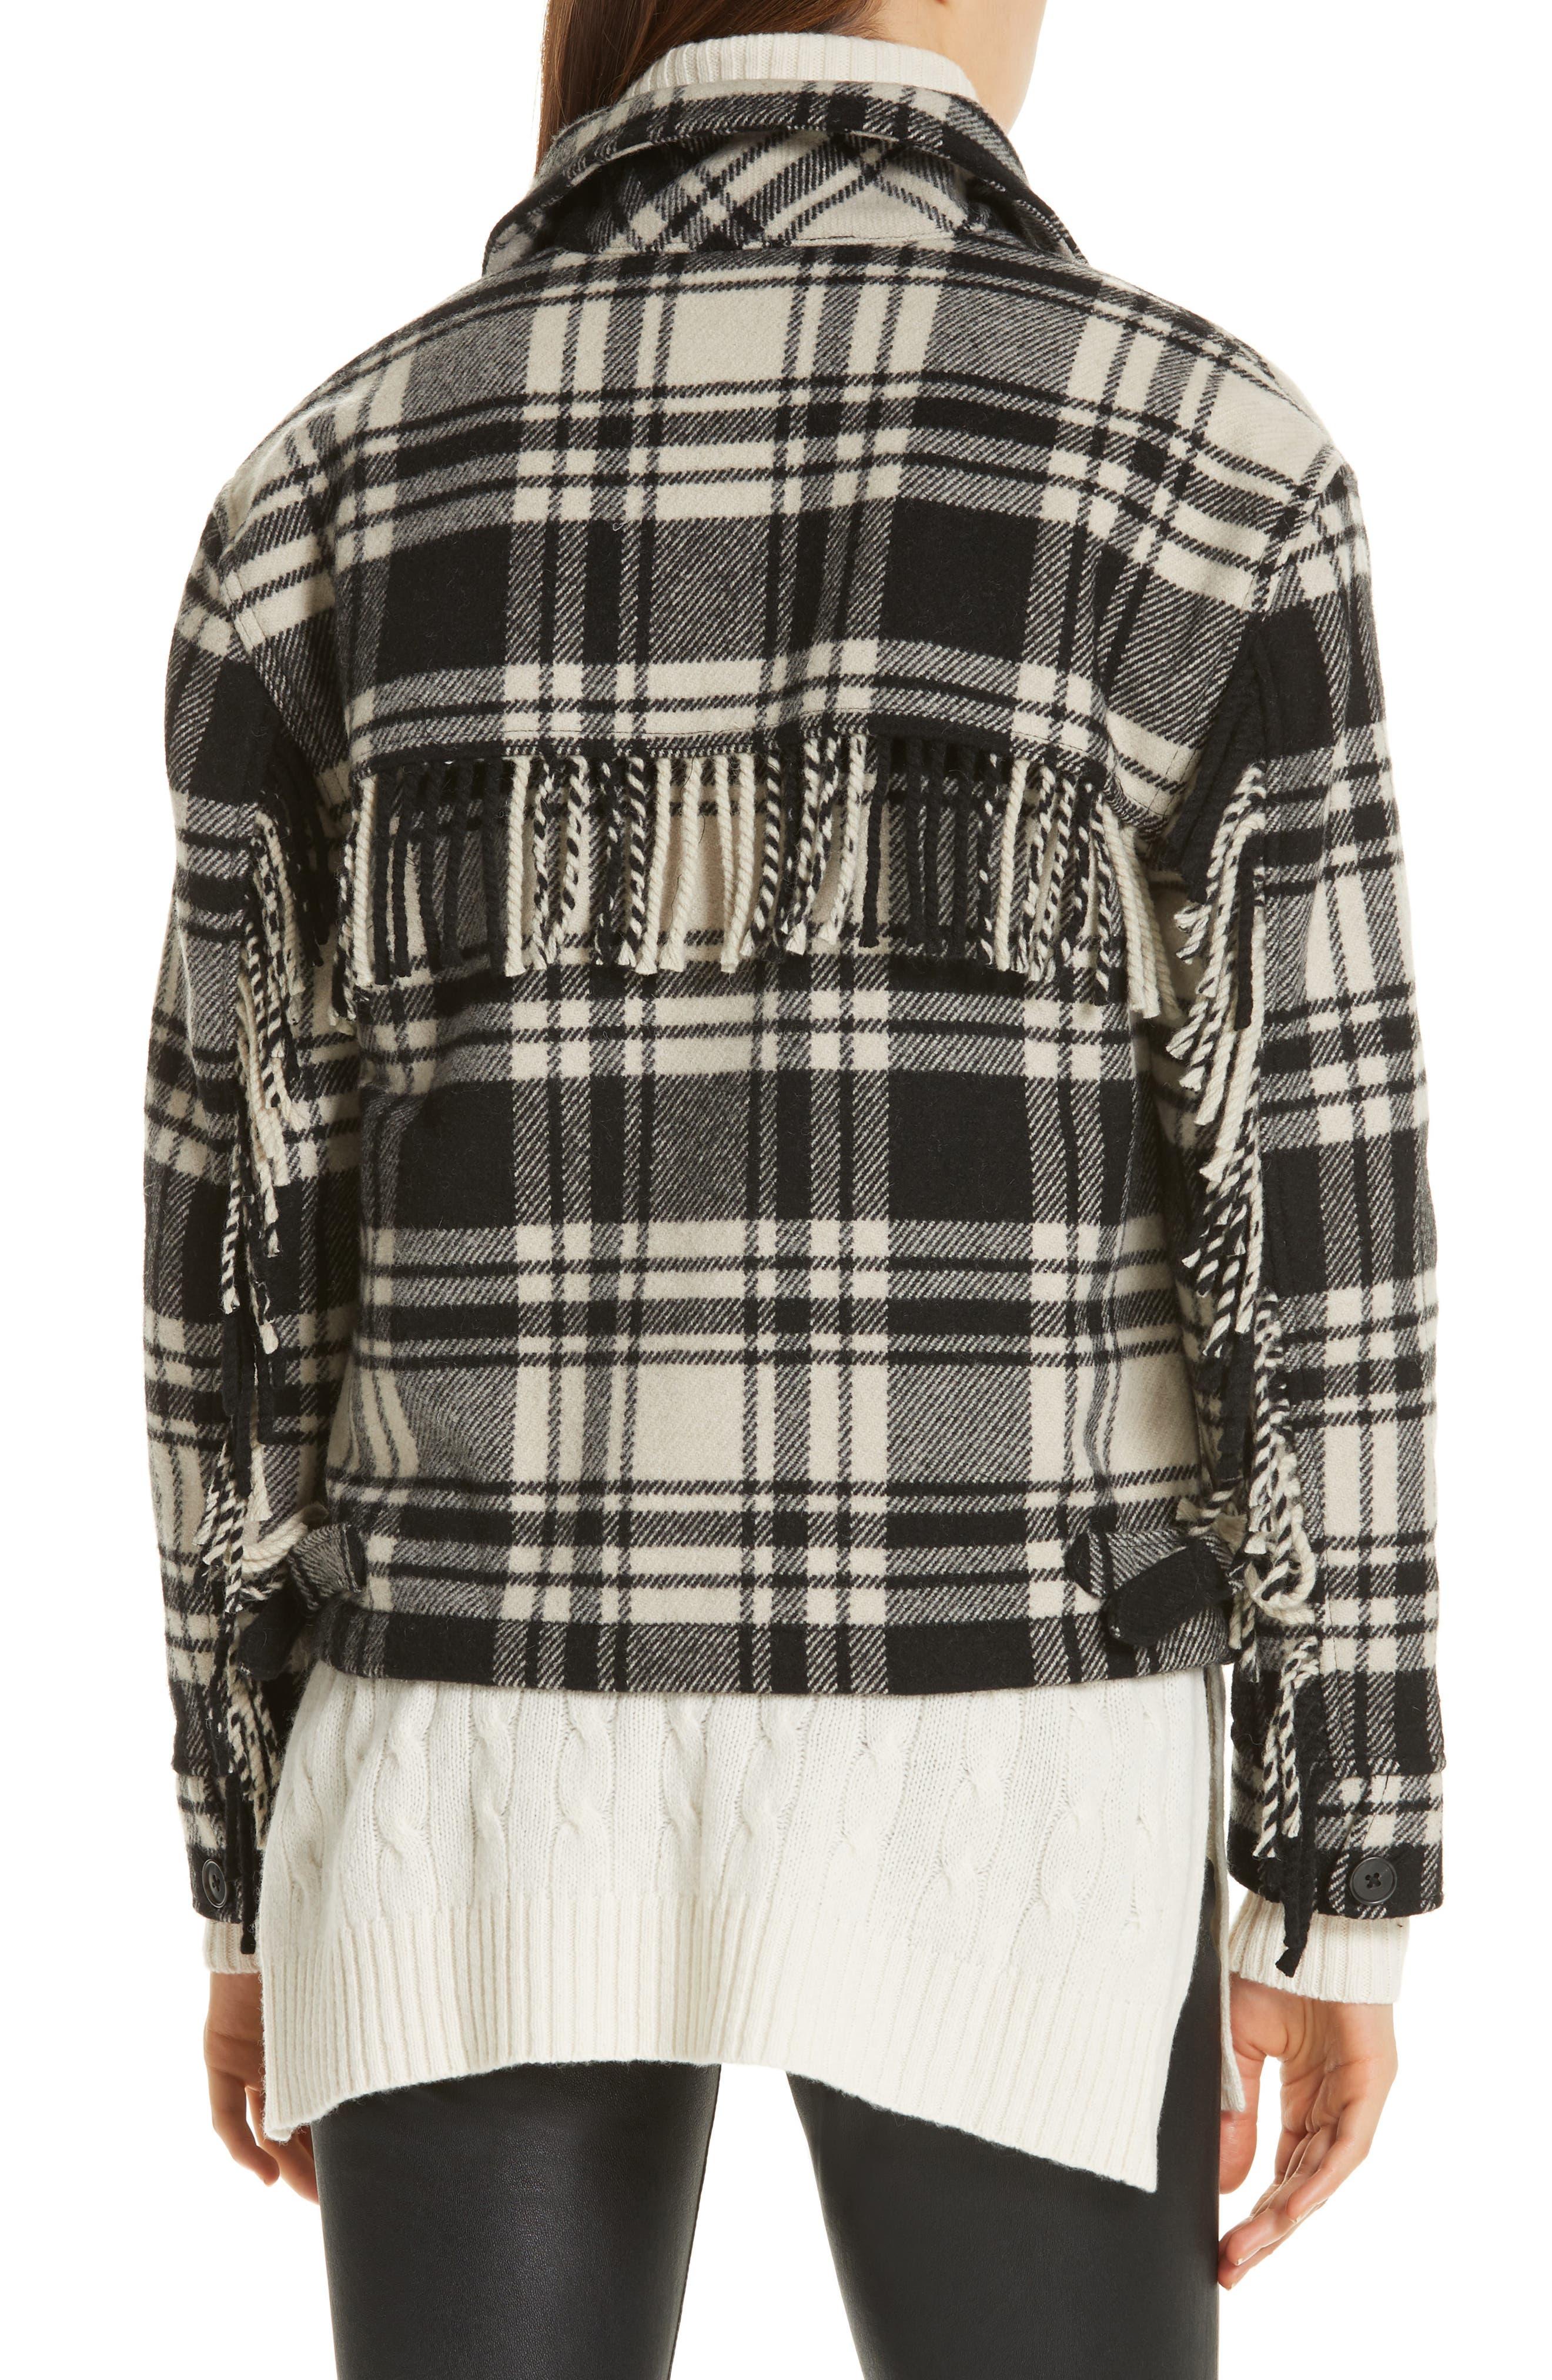 Wool Blend Plaid Jacket,                             Alternate thumbnail 2, color,                             BLACK/ CREAM